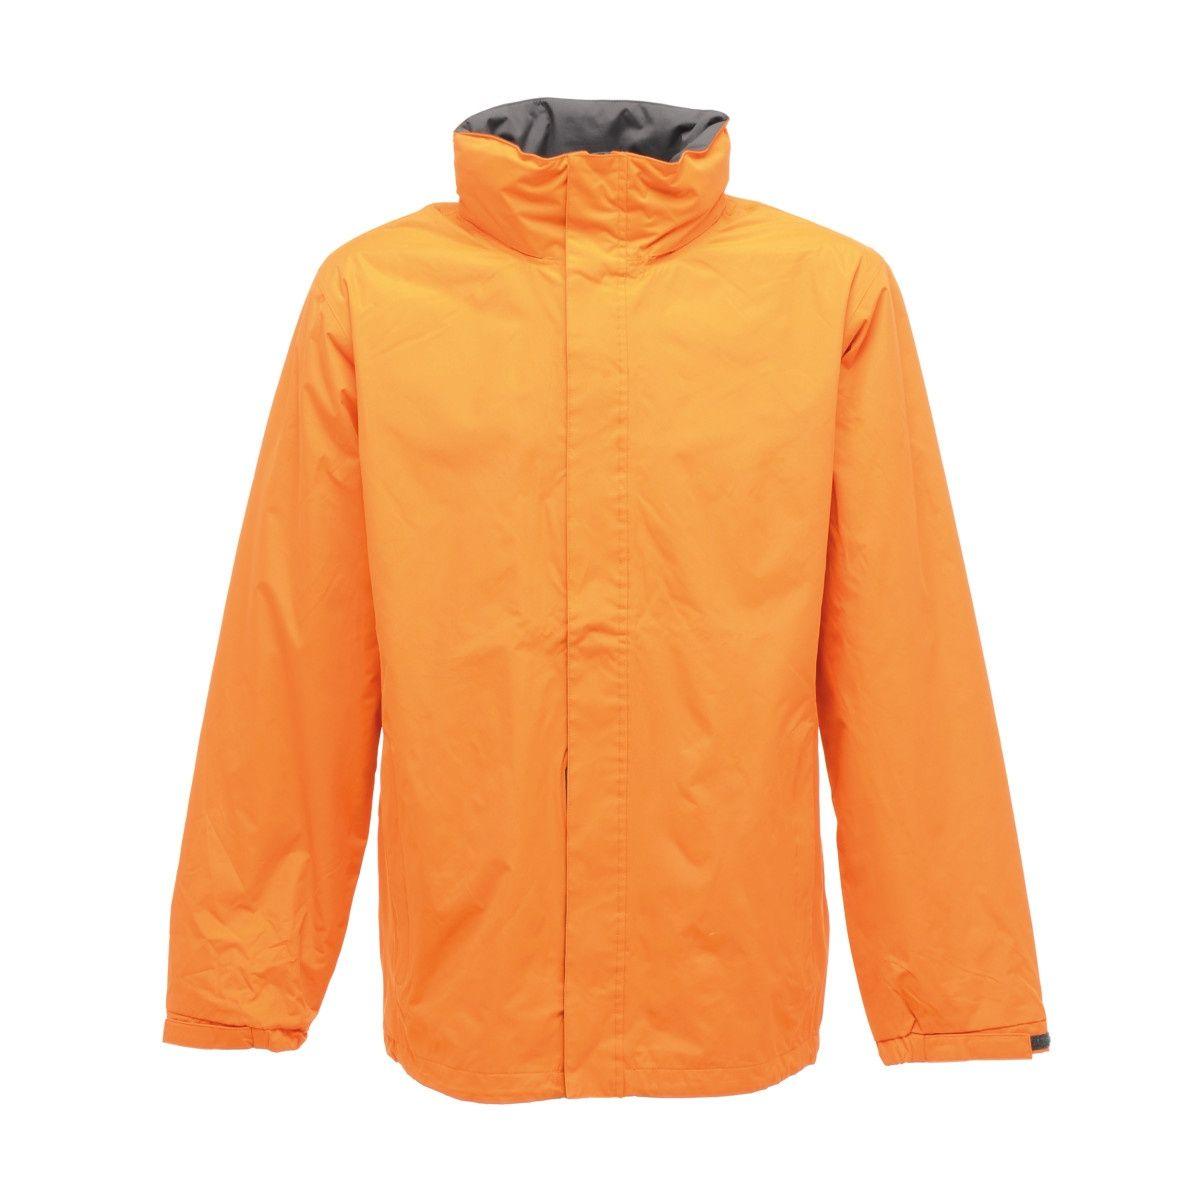 Regatta Mens Standout Ardmore Jacket (Waterproof & Windproof) (Sun Orange/Seal Grey)